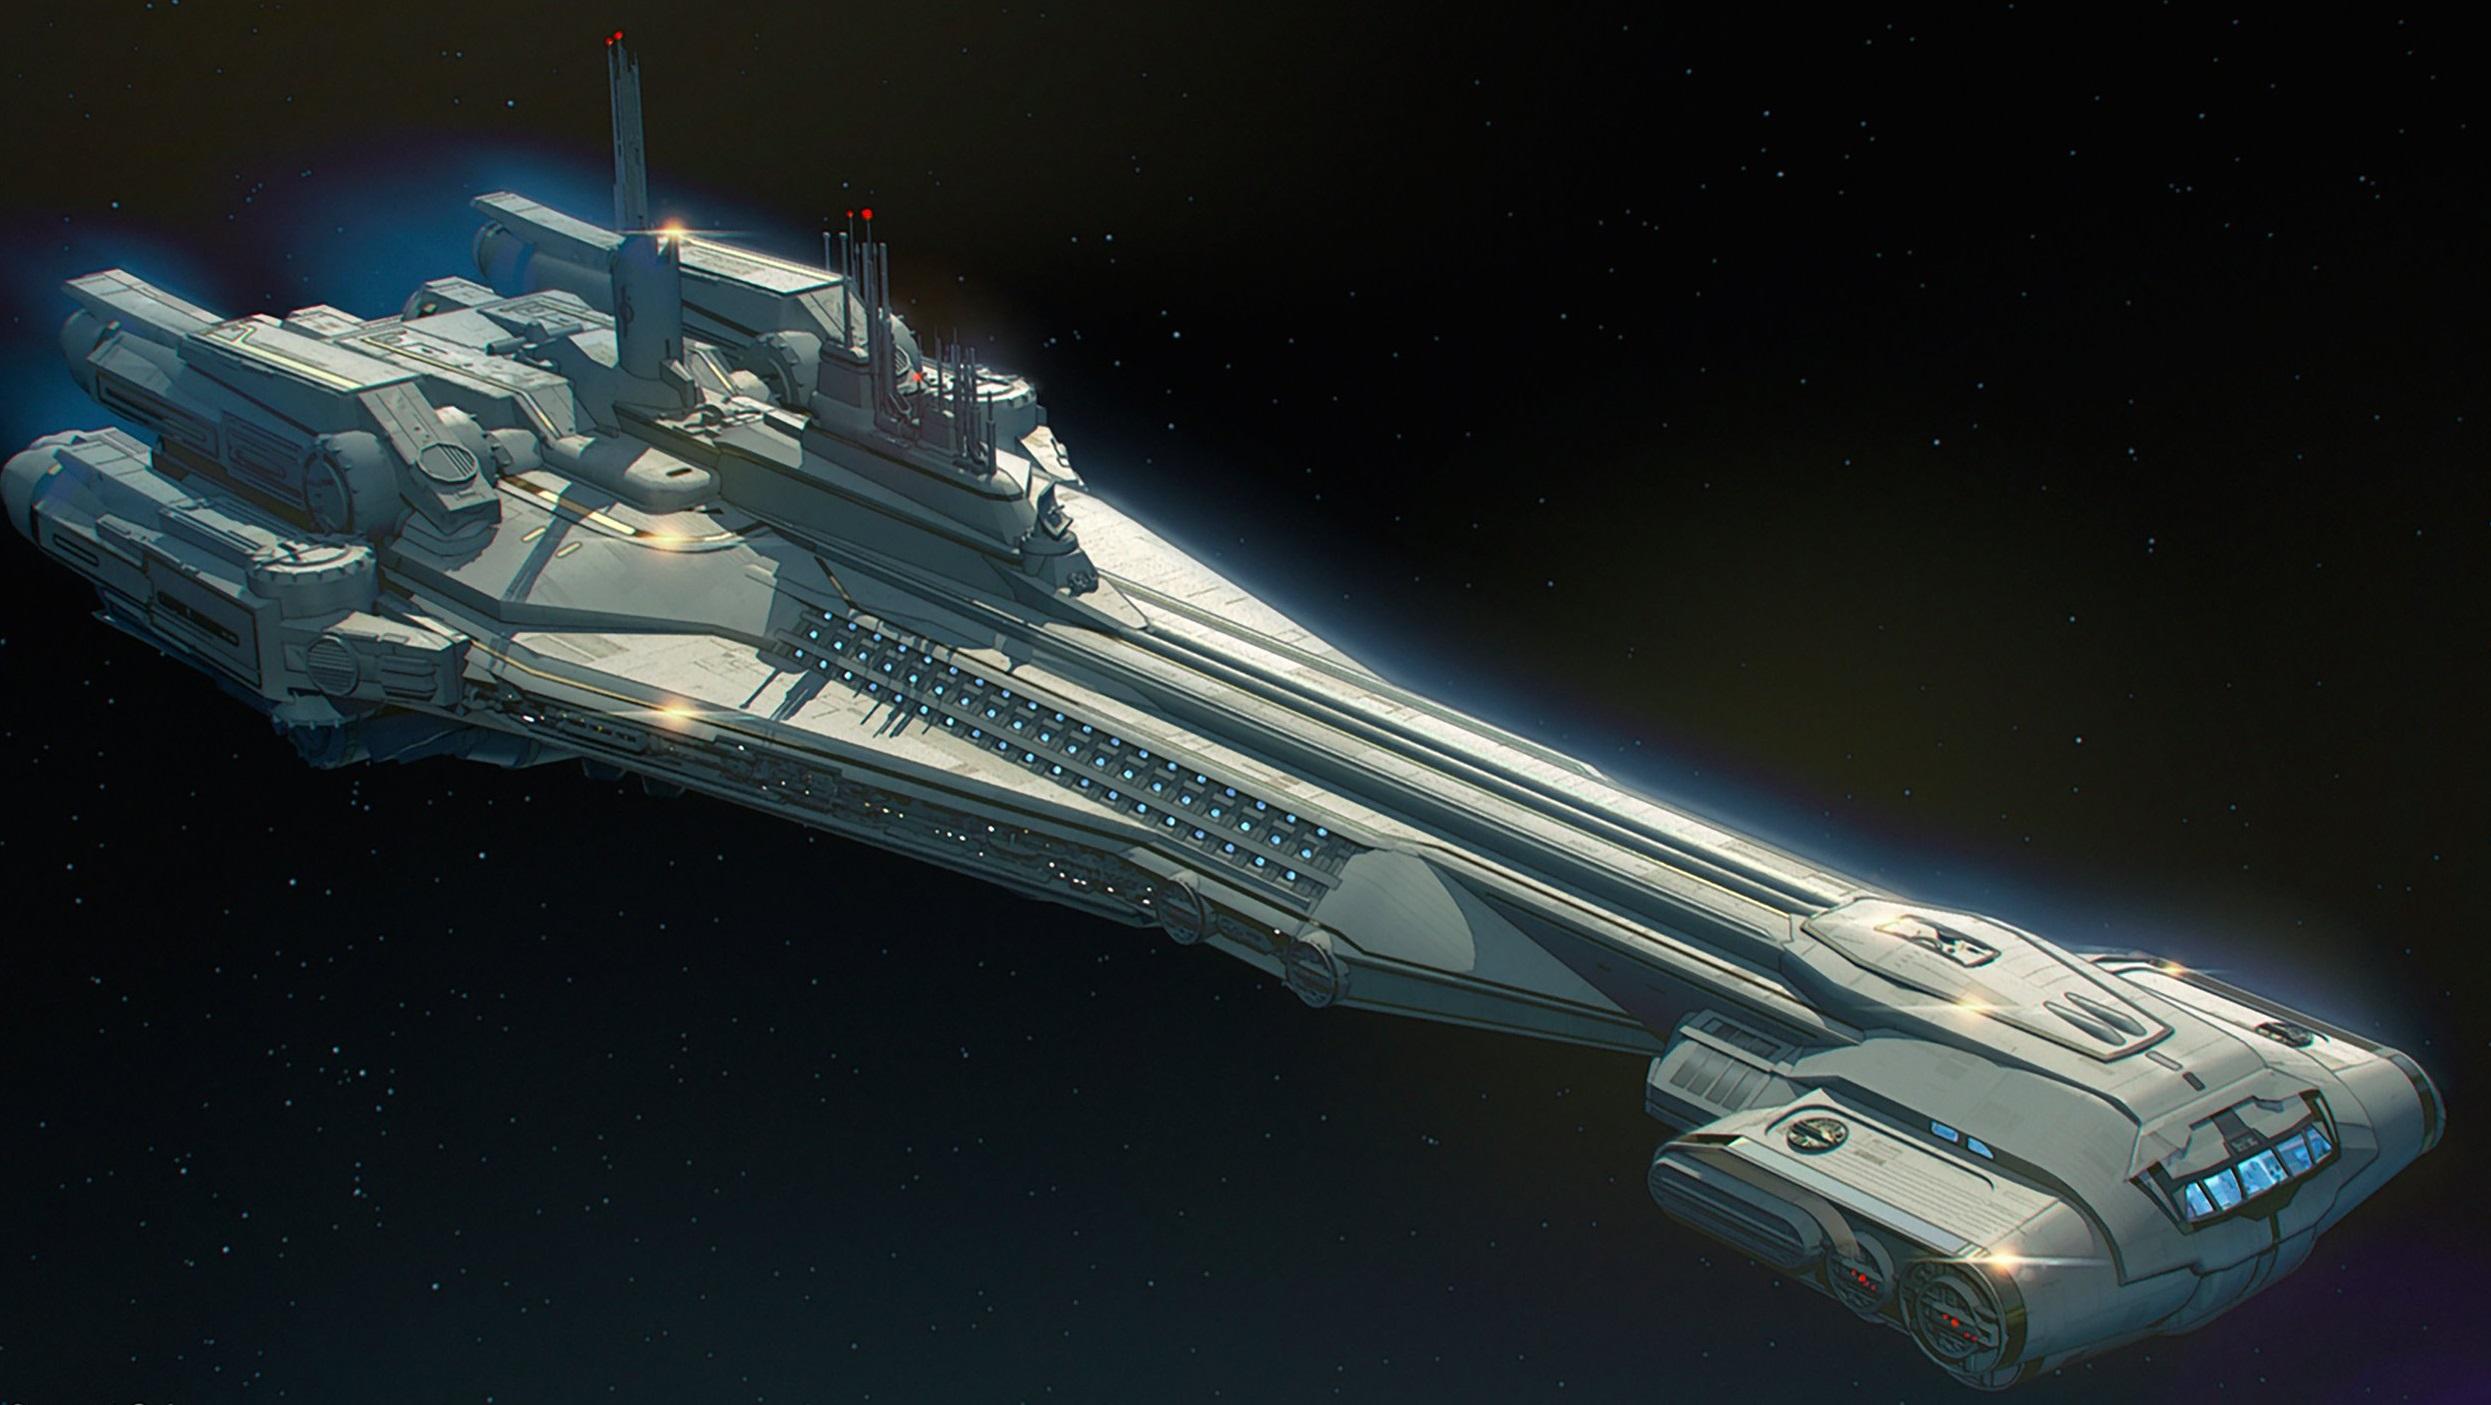 Halcyon Starcruiser